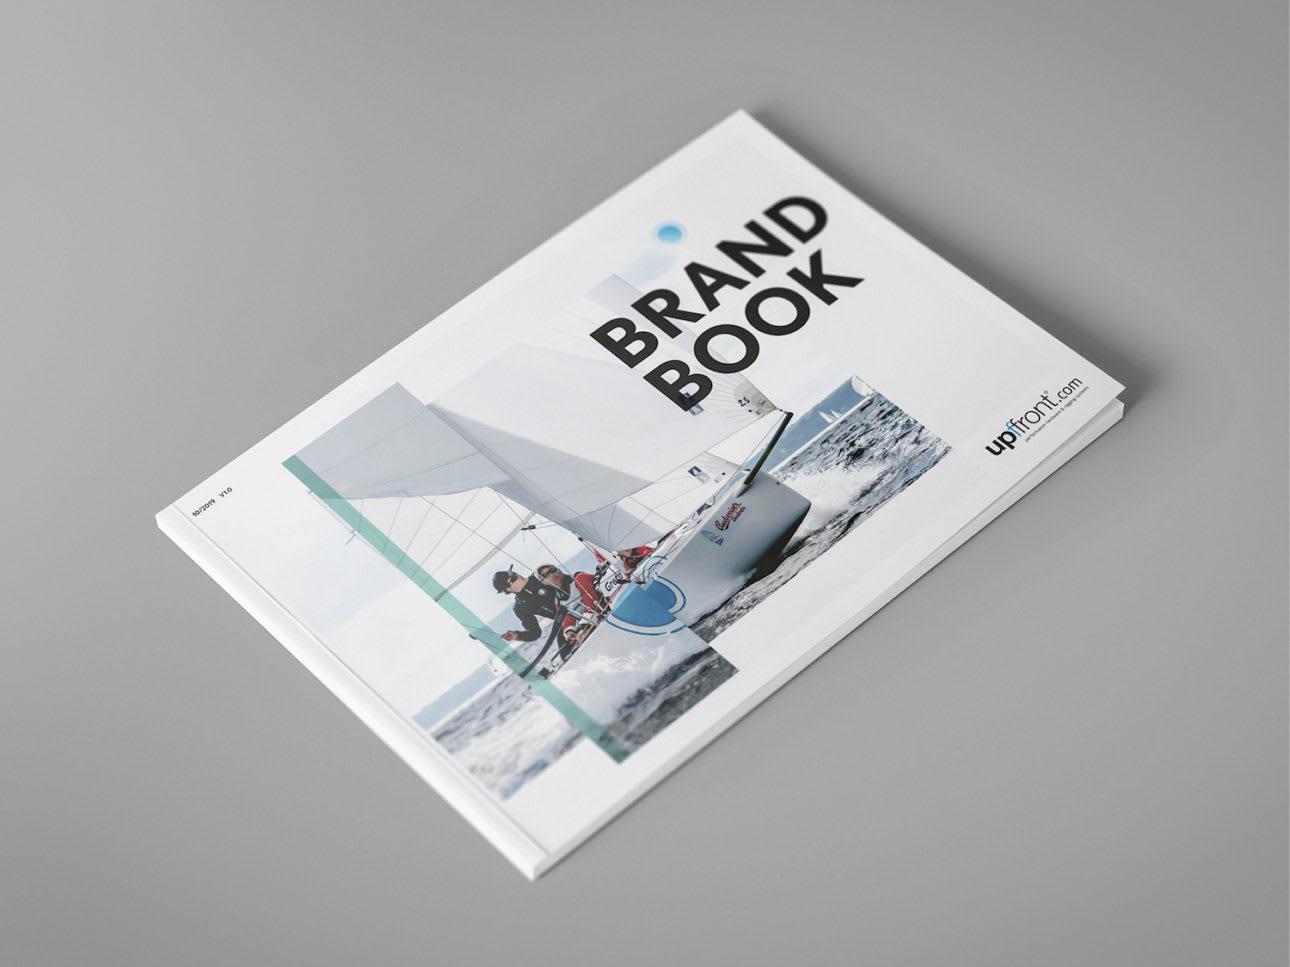 WORK Upffront Mock Up Brand Book Cover